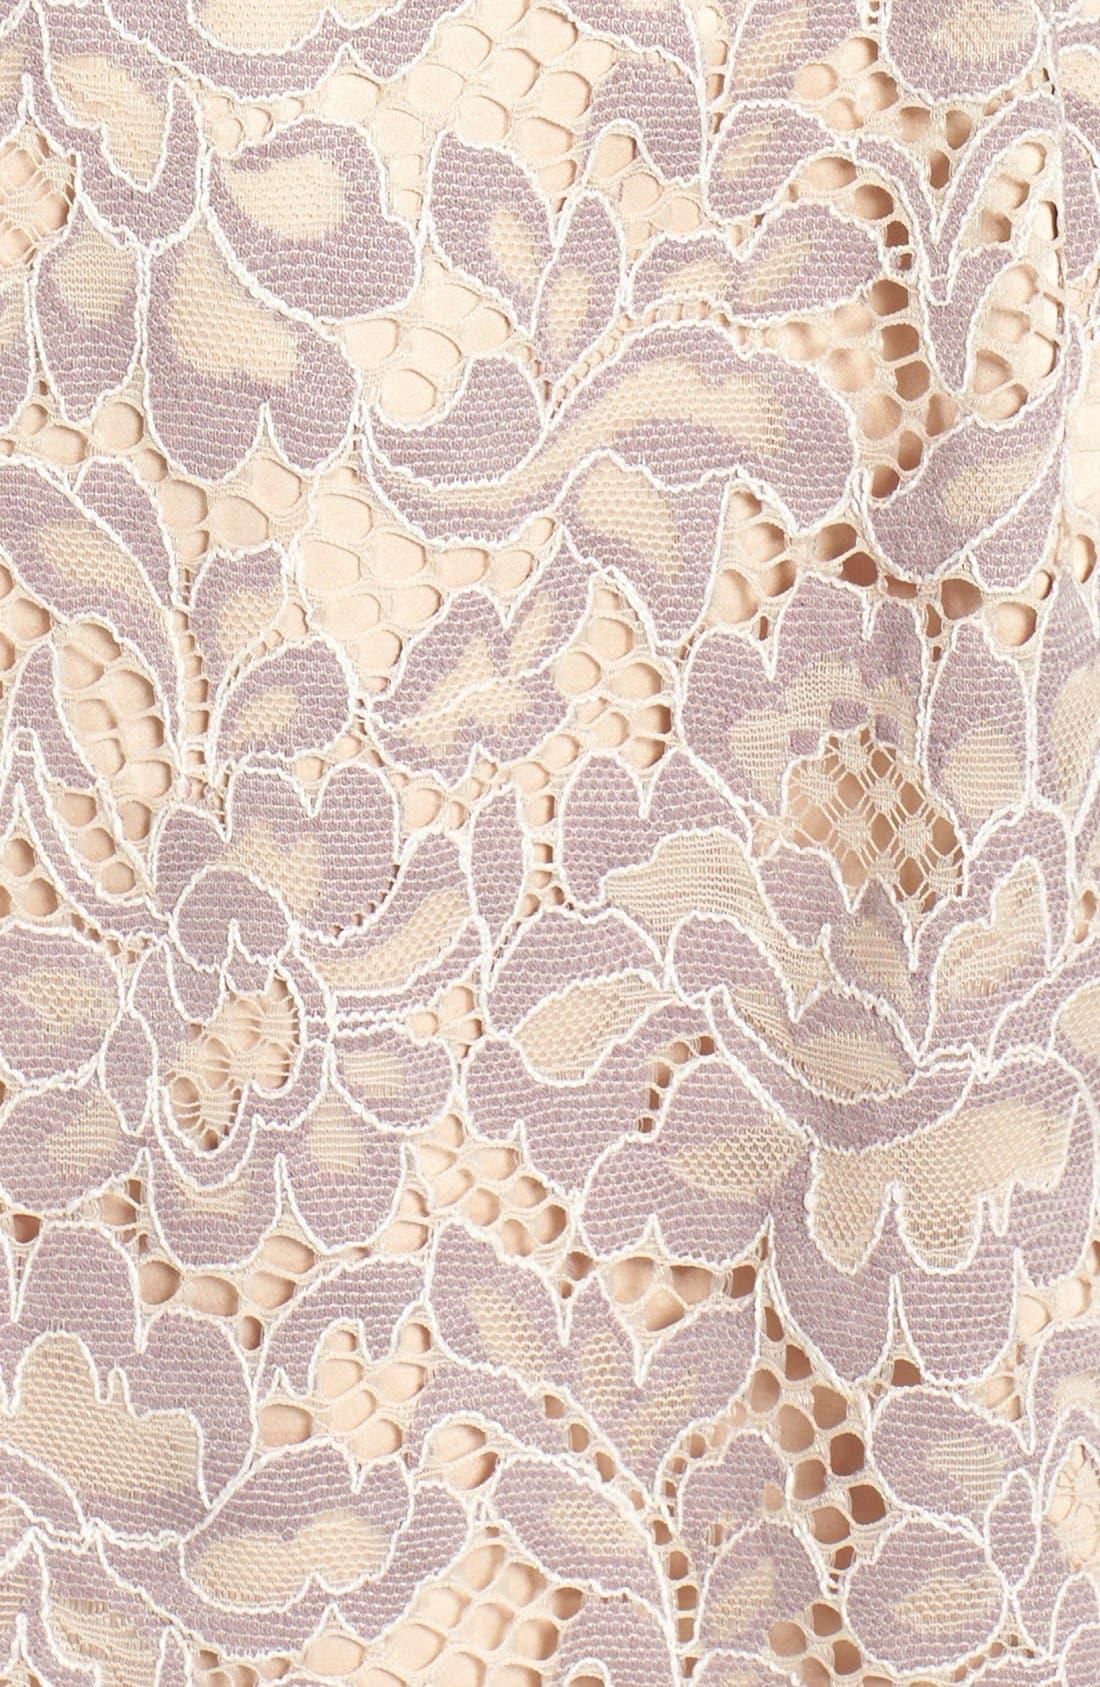 Lace Fit & Flare Dress,                             Alternate thumbnail 11, color,                             030